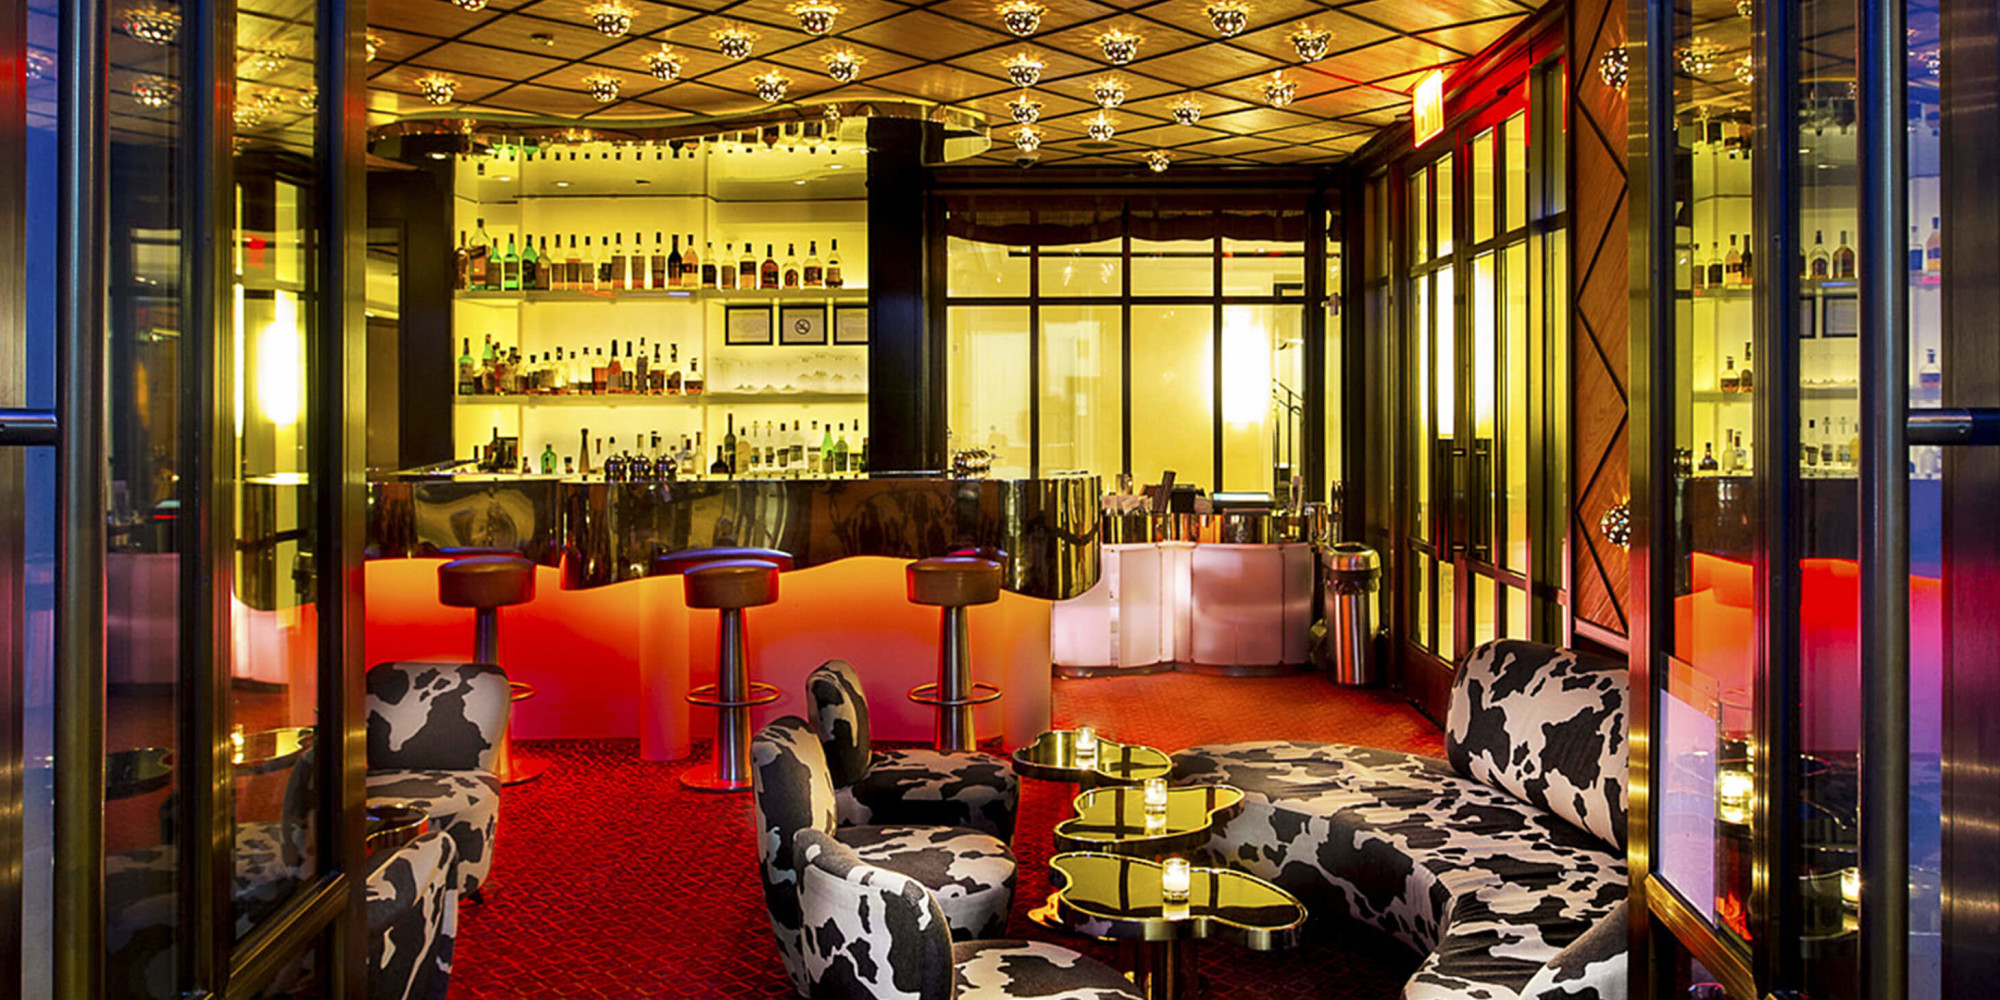 The George Hotel Bar Restaurant